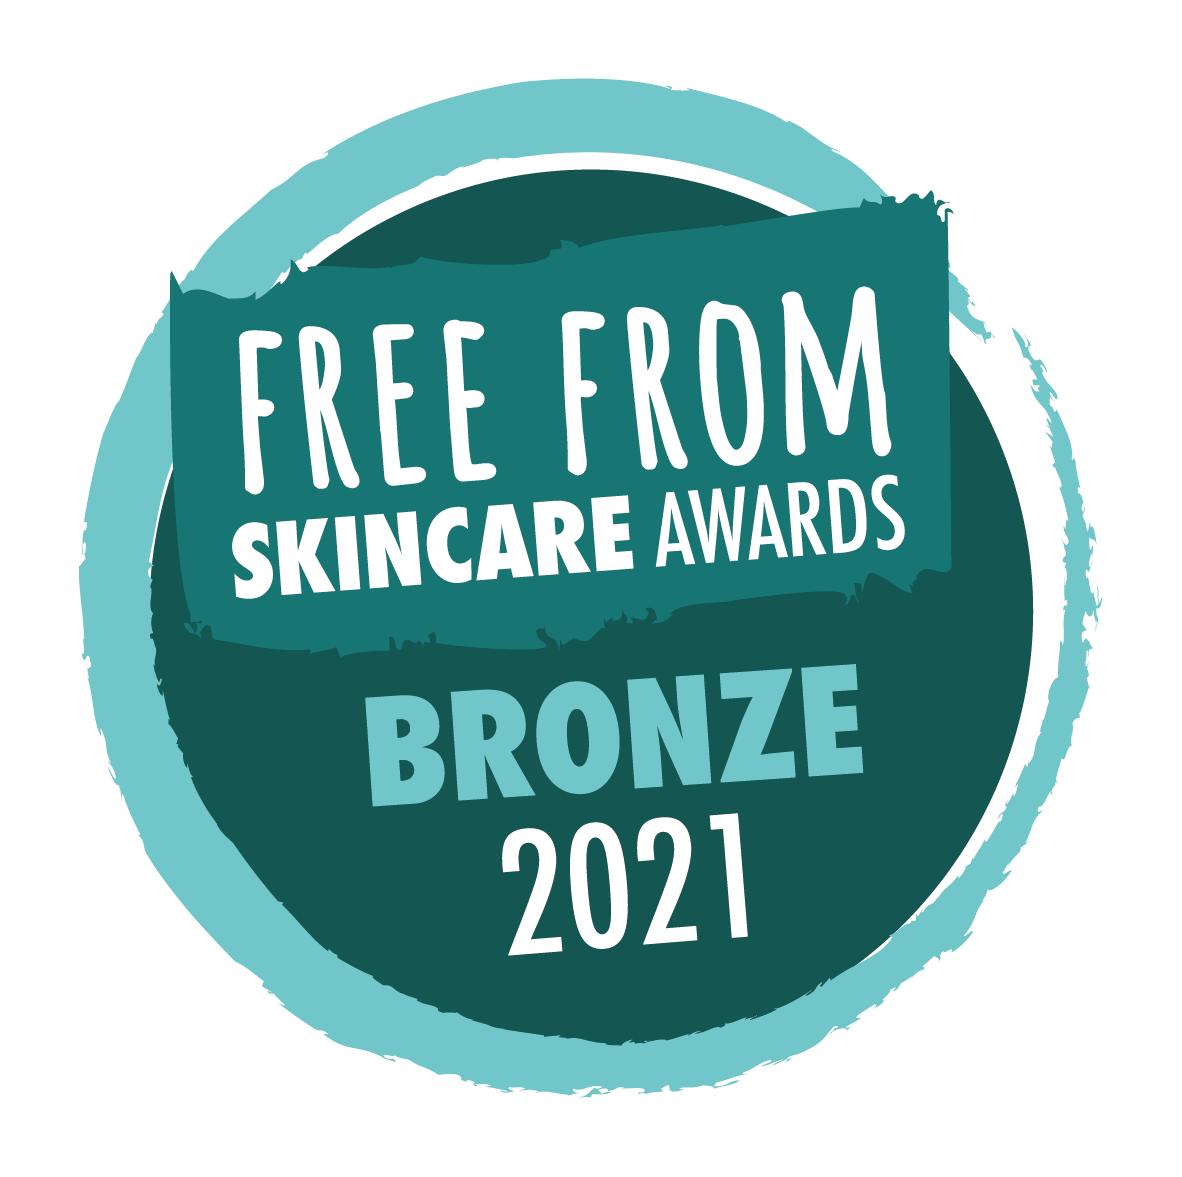 ffsa-bronze-2021-web-white-background.png